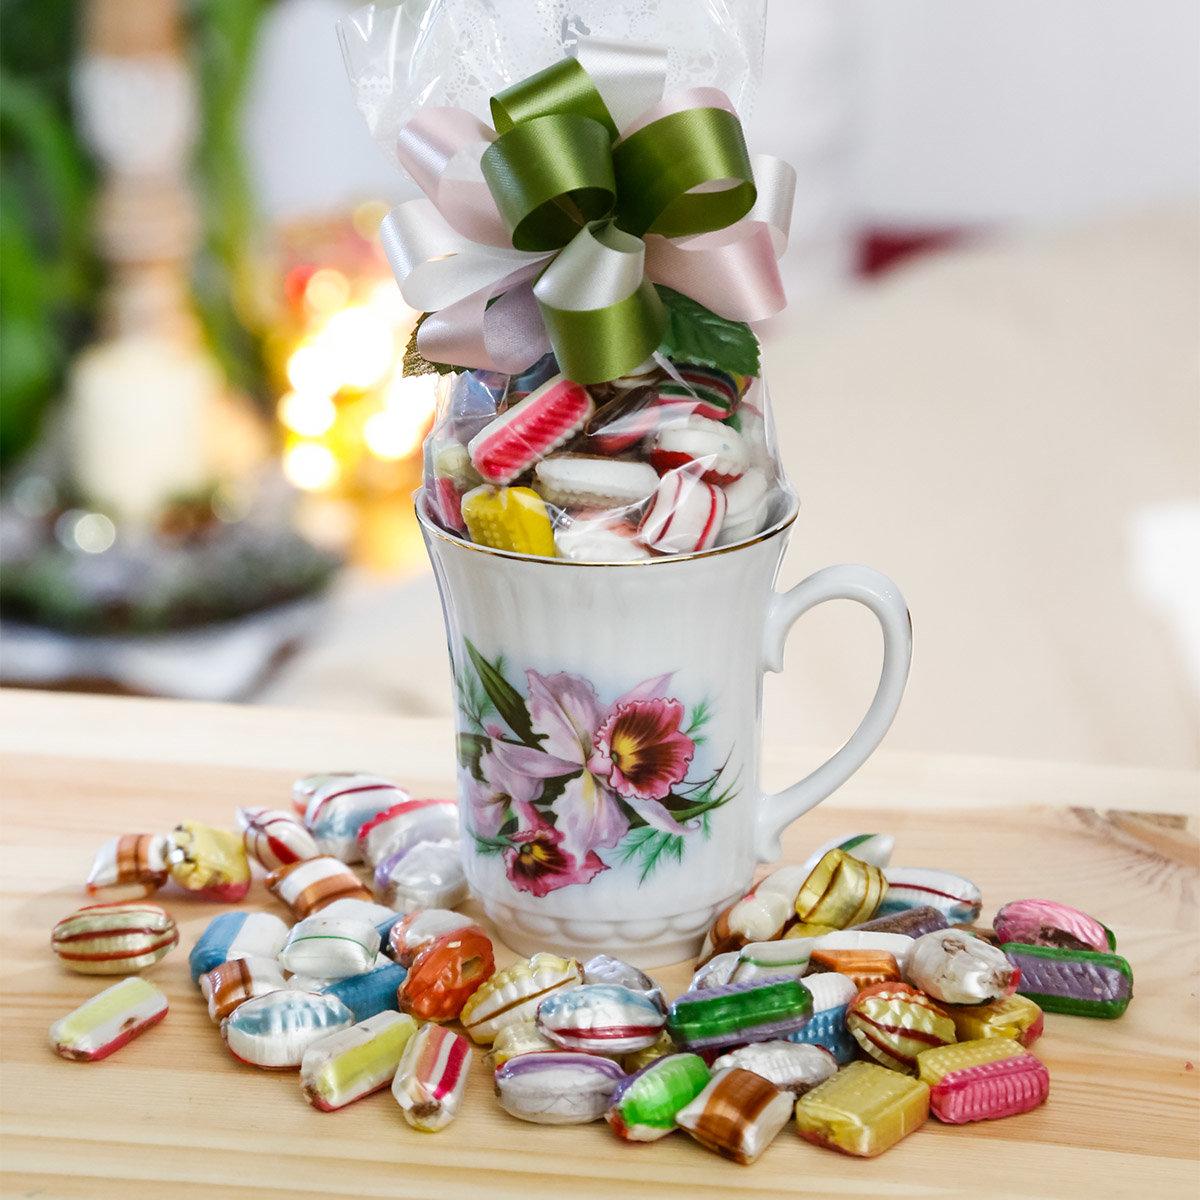 Geschenk-Tasse Orchidee mit 100g Fourrée-Bonbons